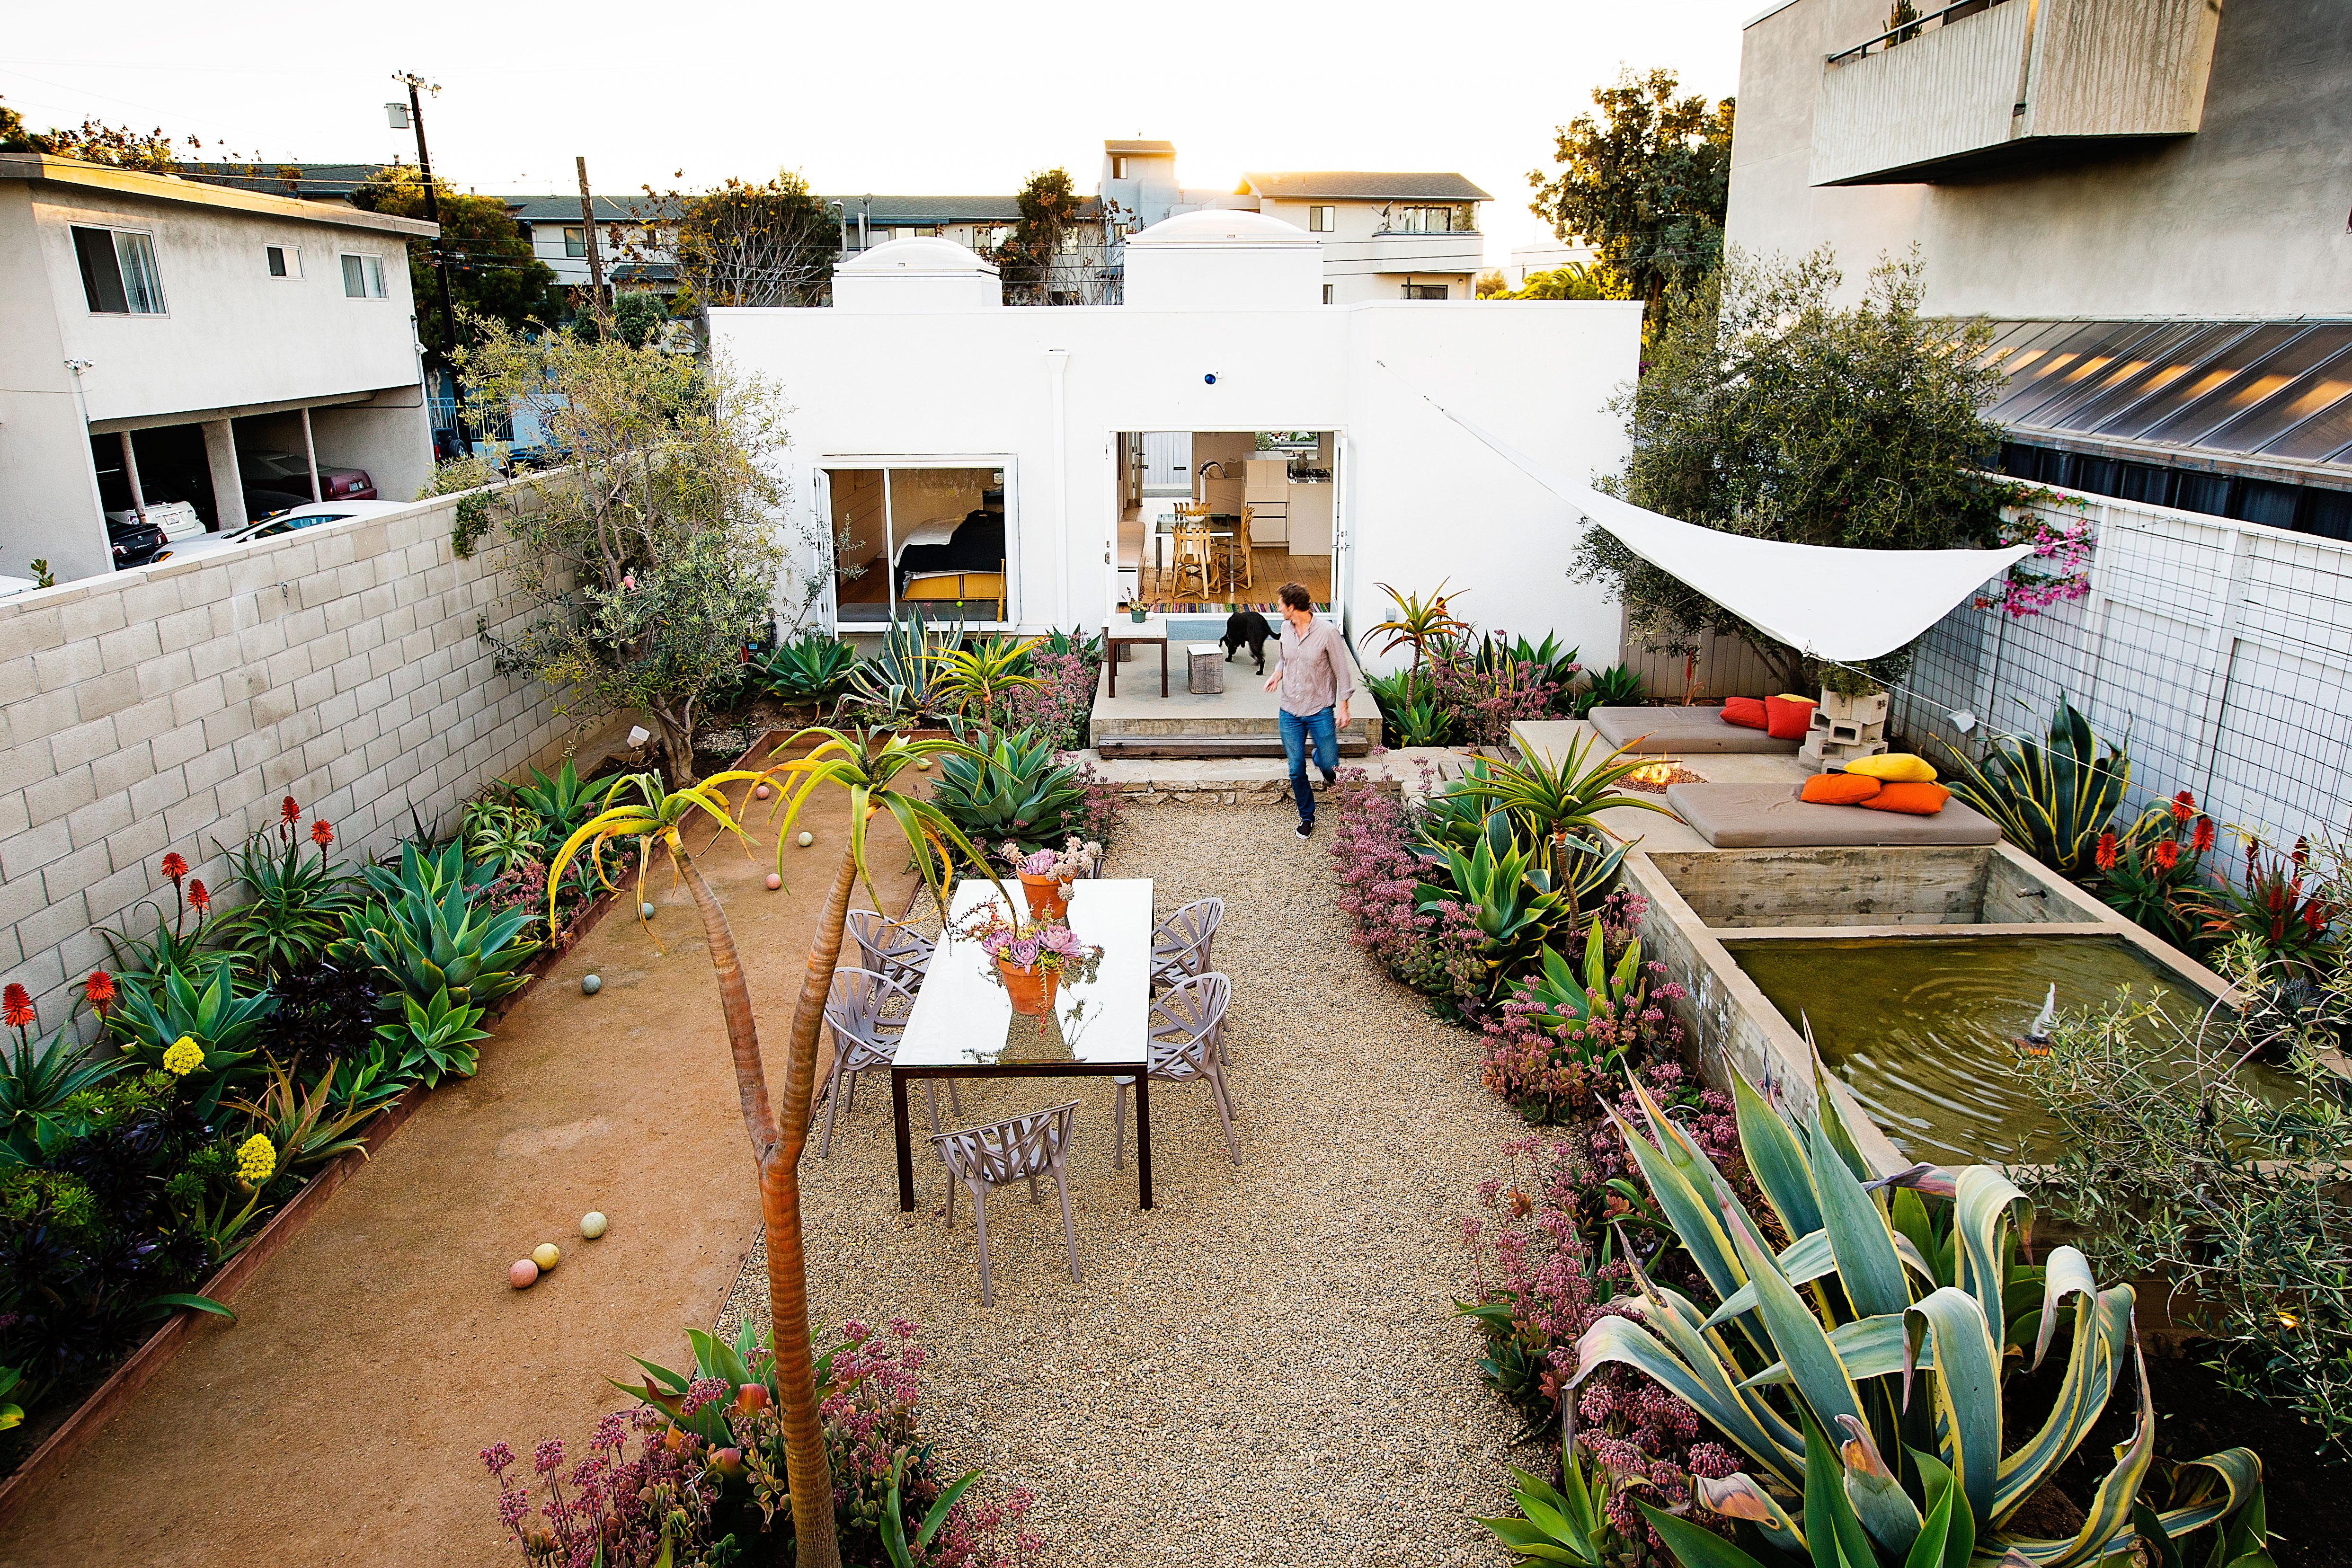 Bento Box Outdoor Living Spaces Sunset Magazine